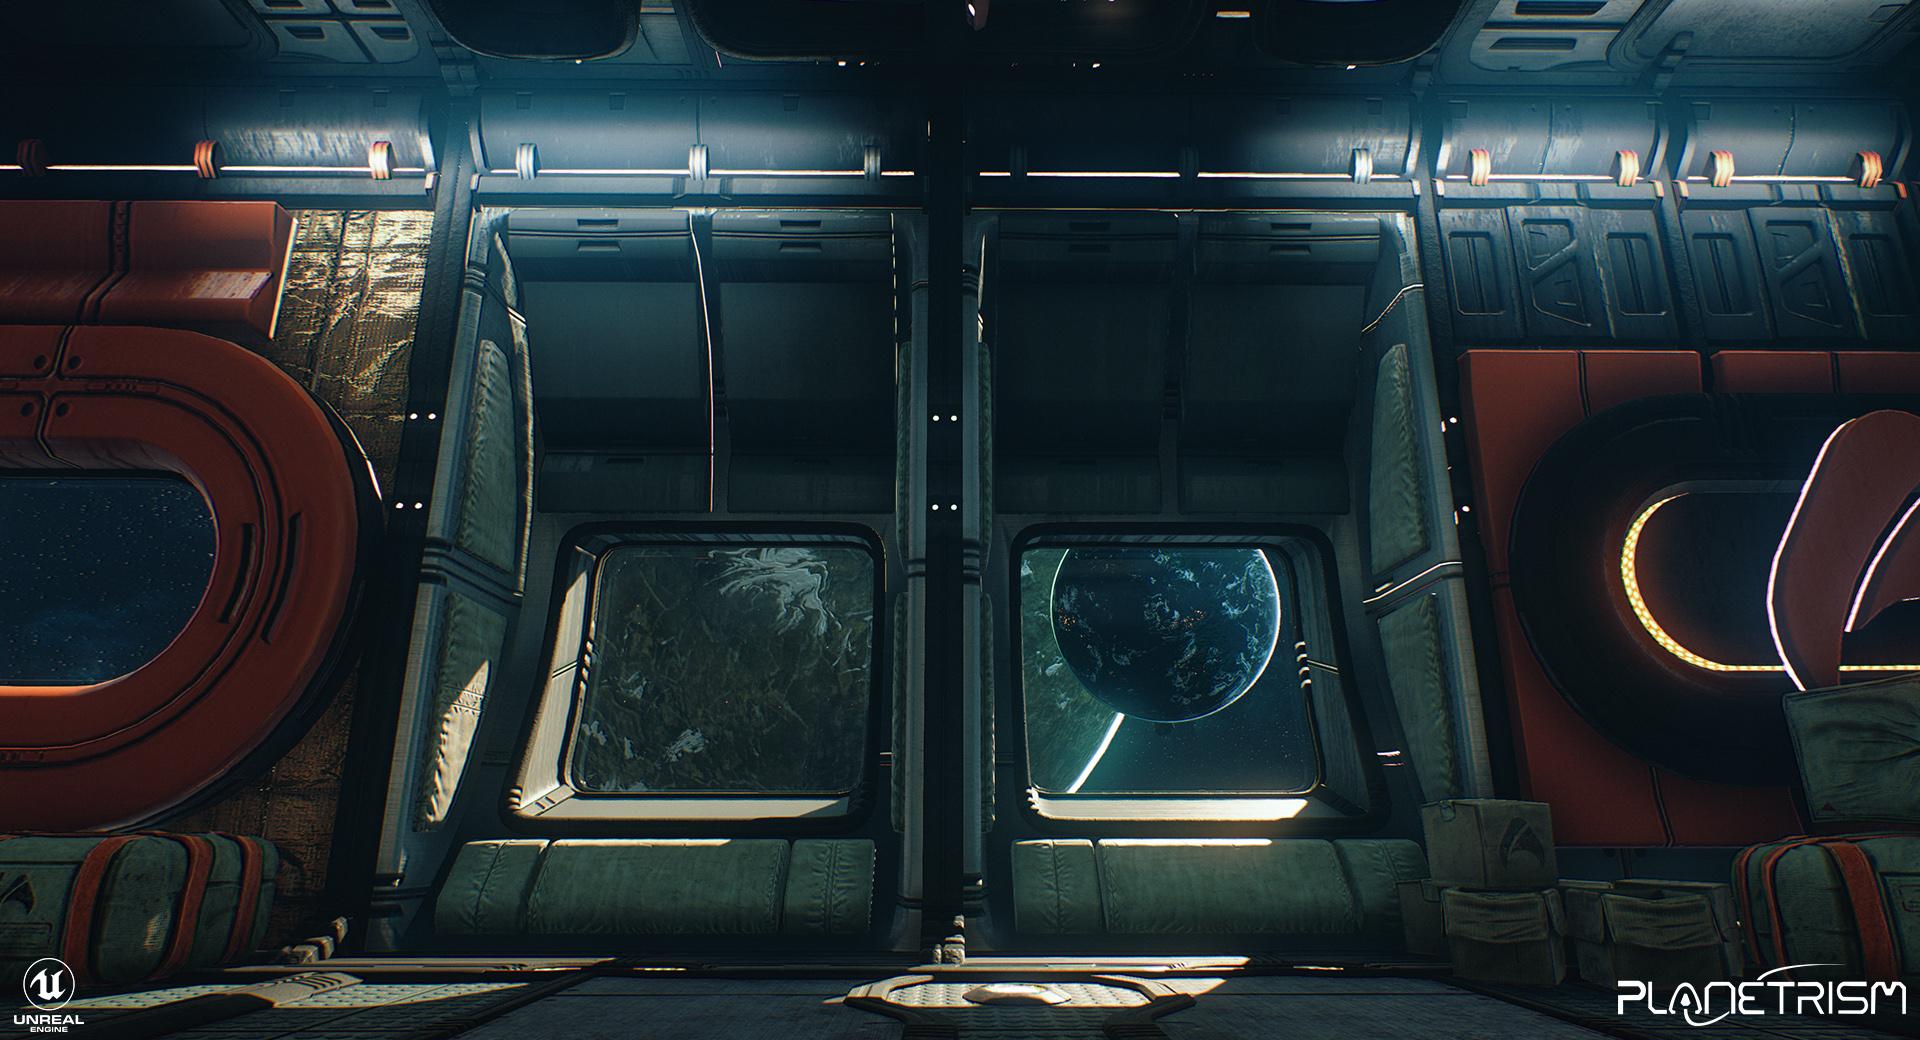 Planetrism - Space Station Hub